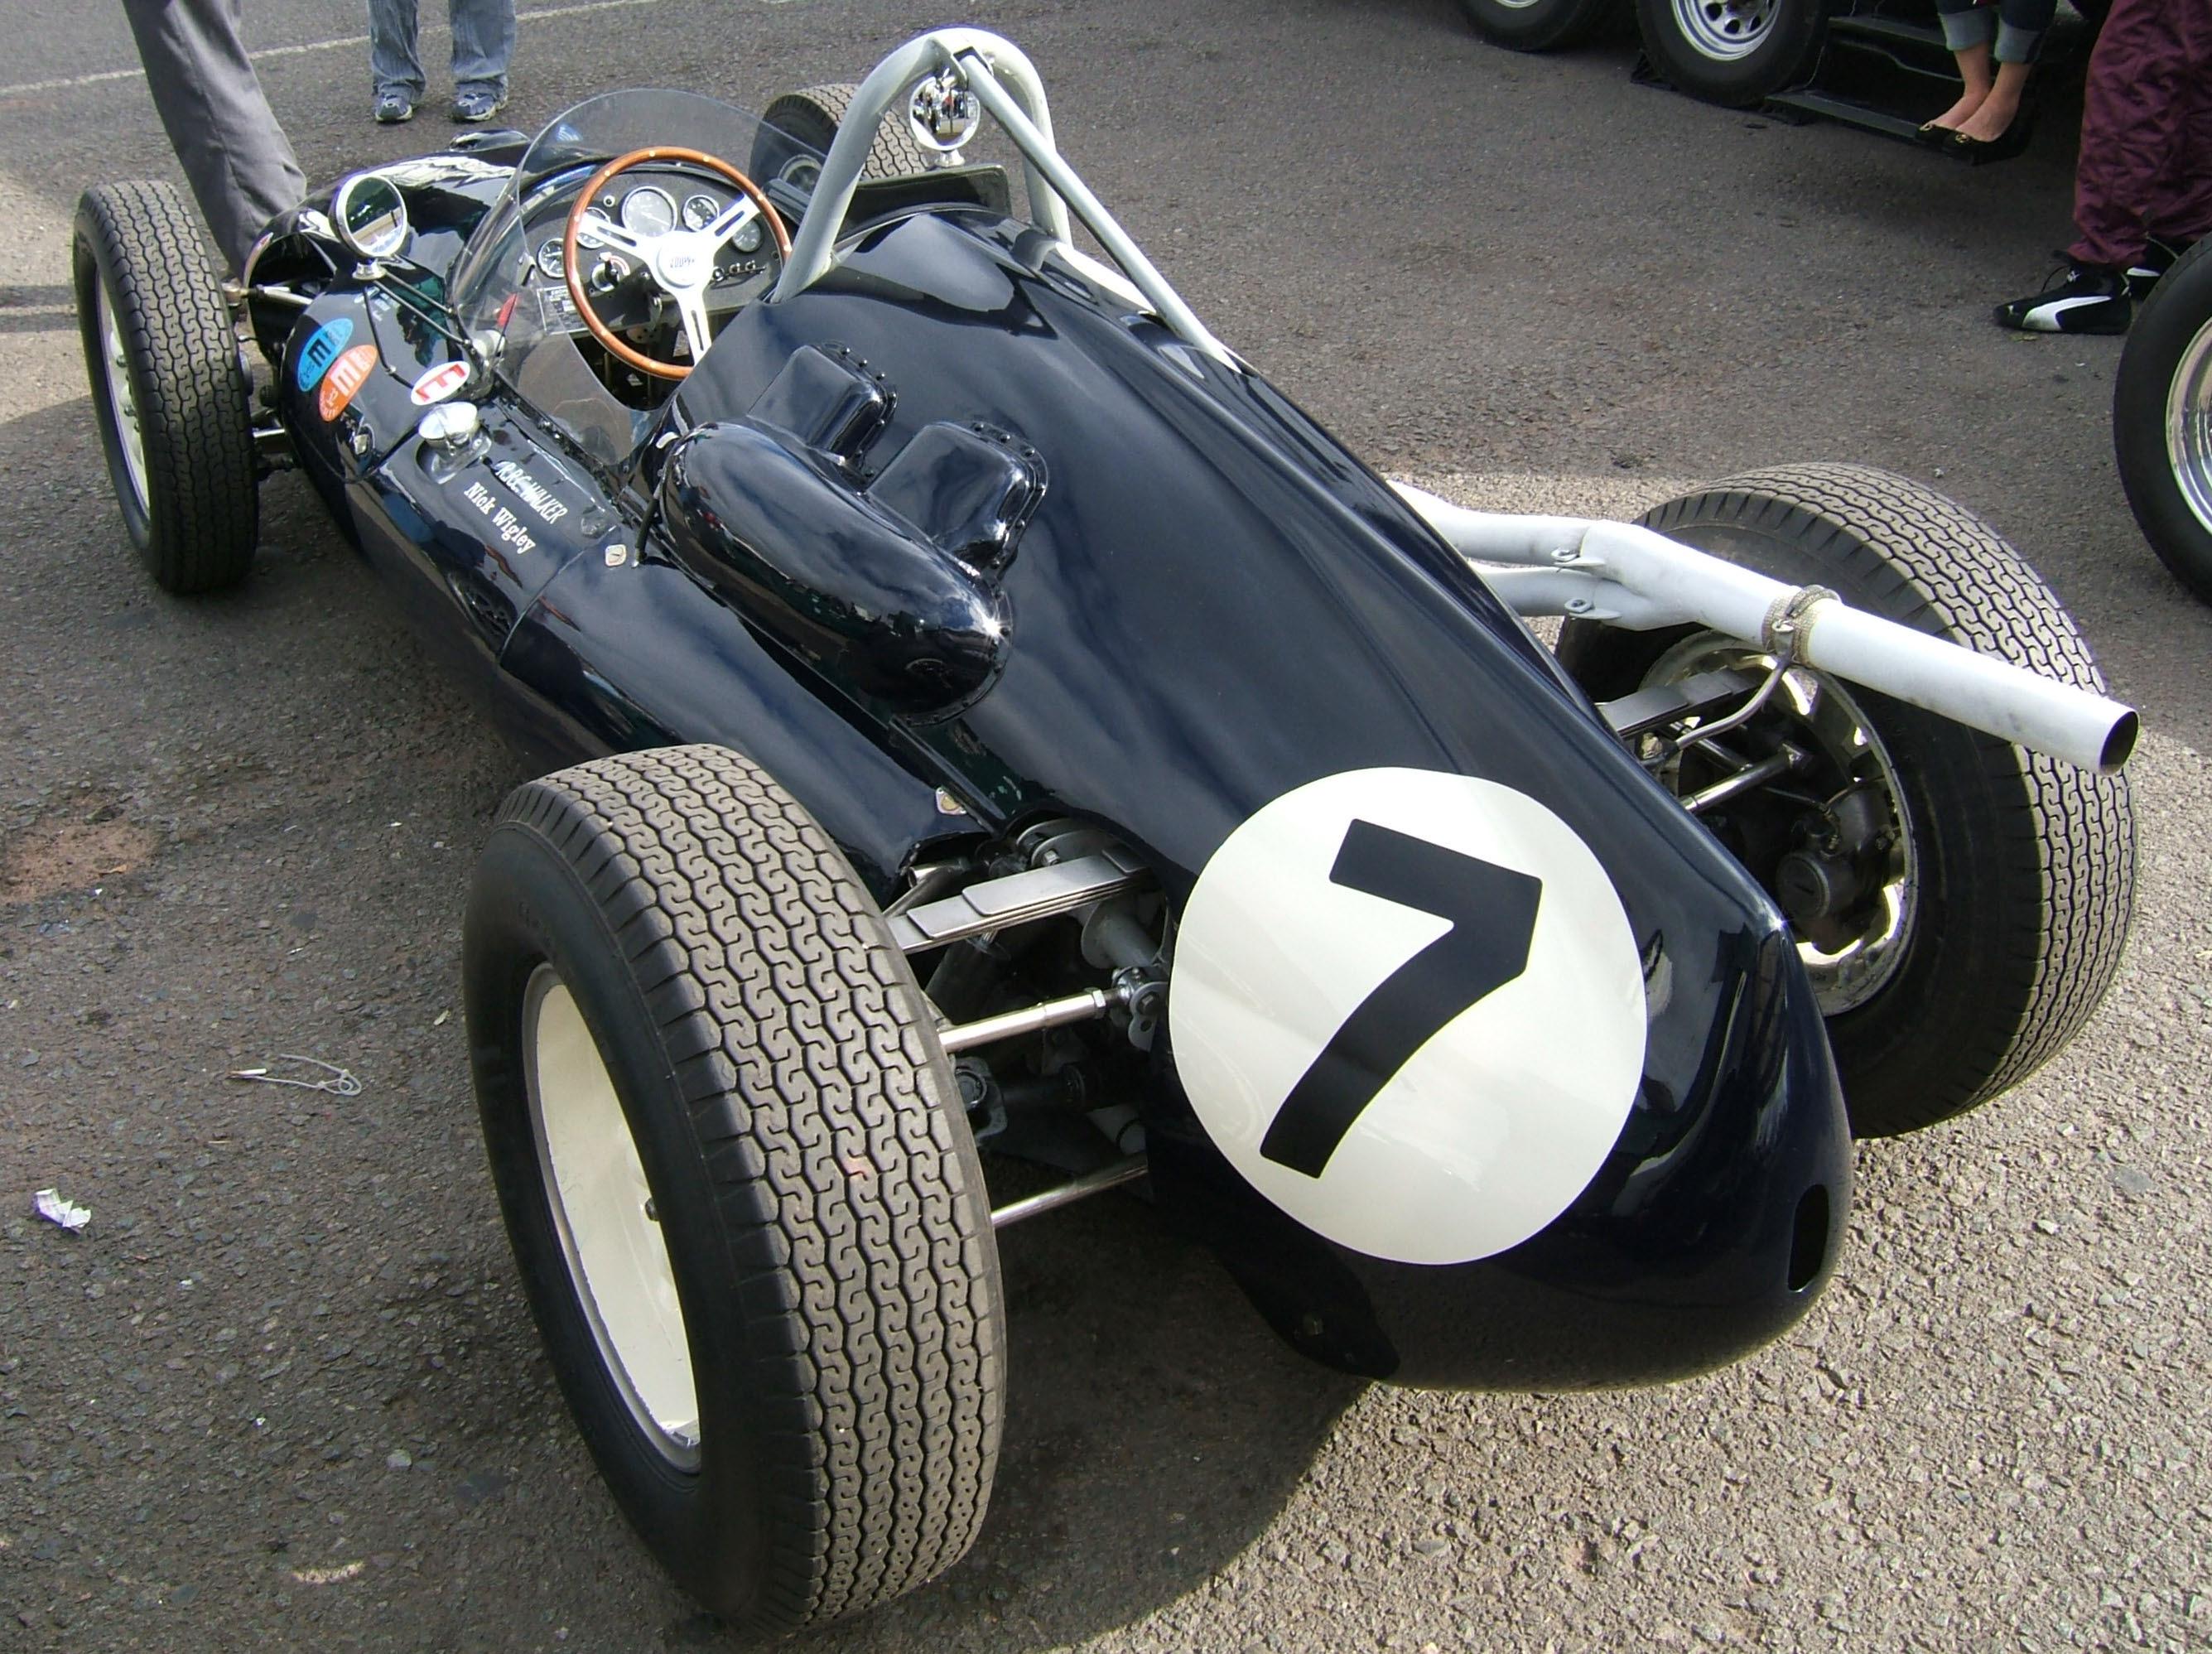 Vintage Open Wheel Race Cars For Sale